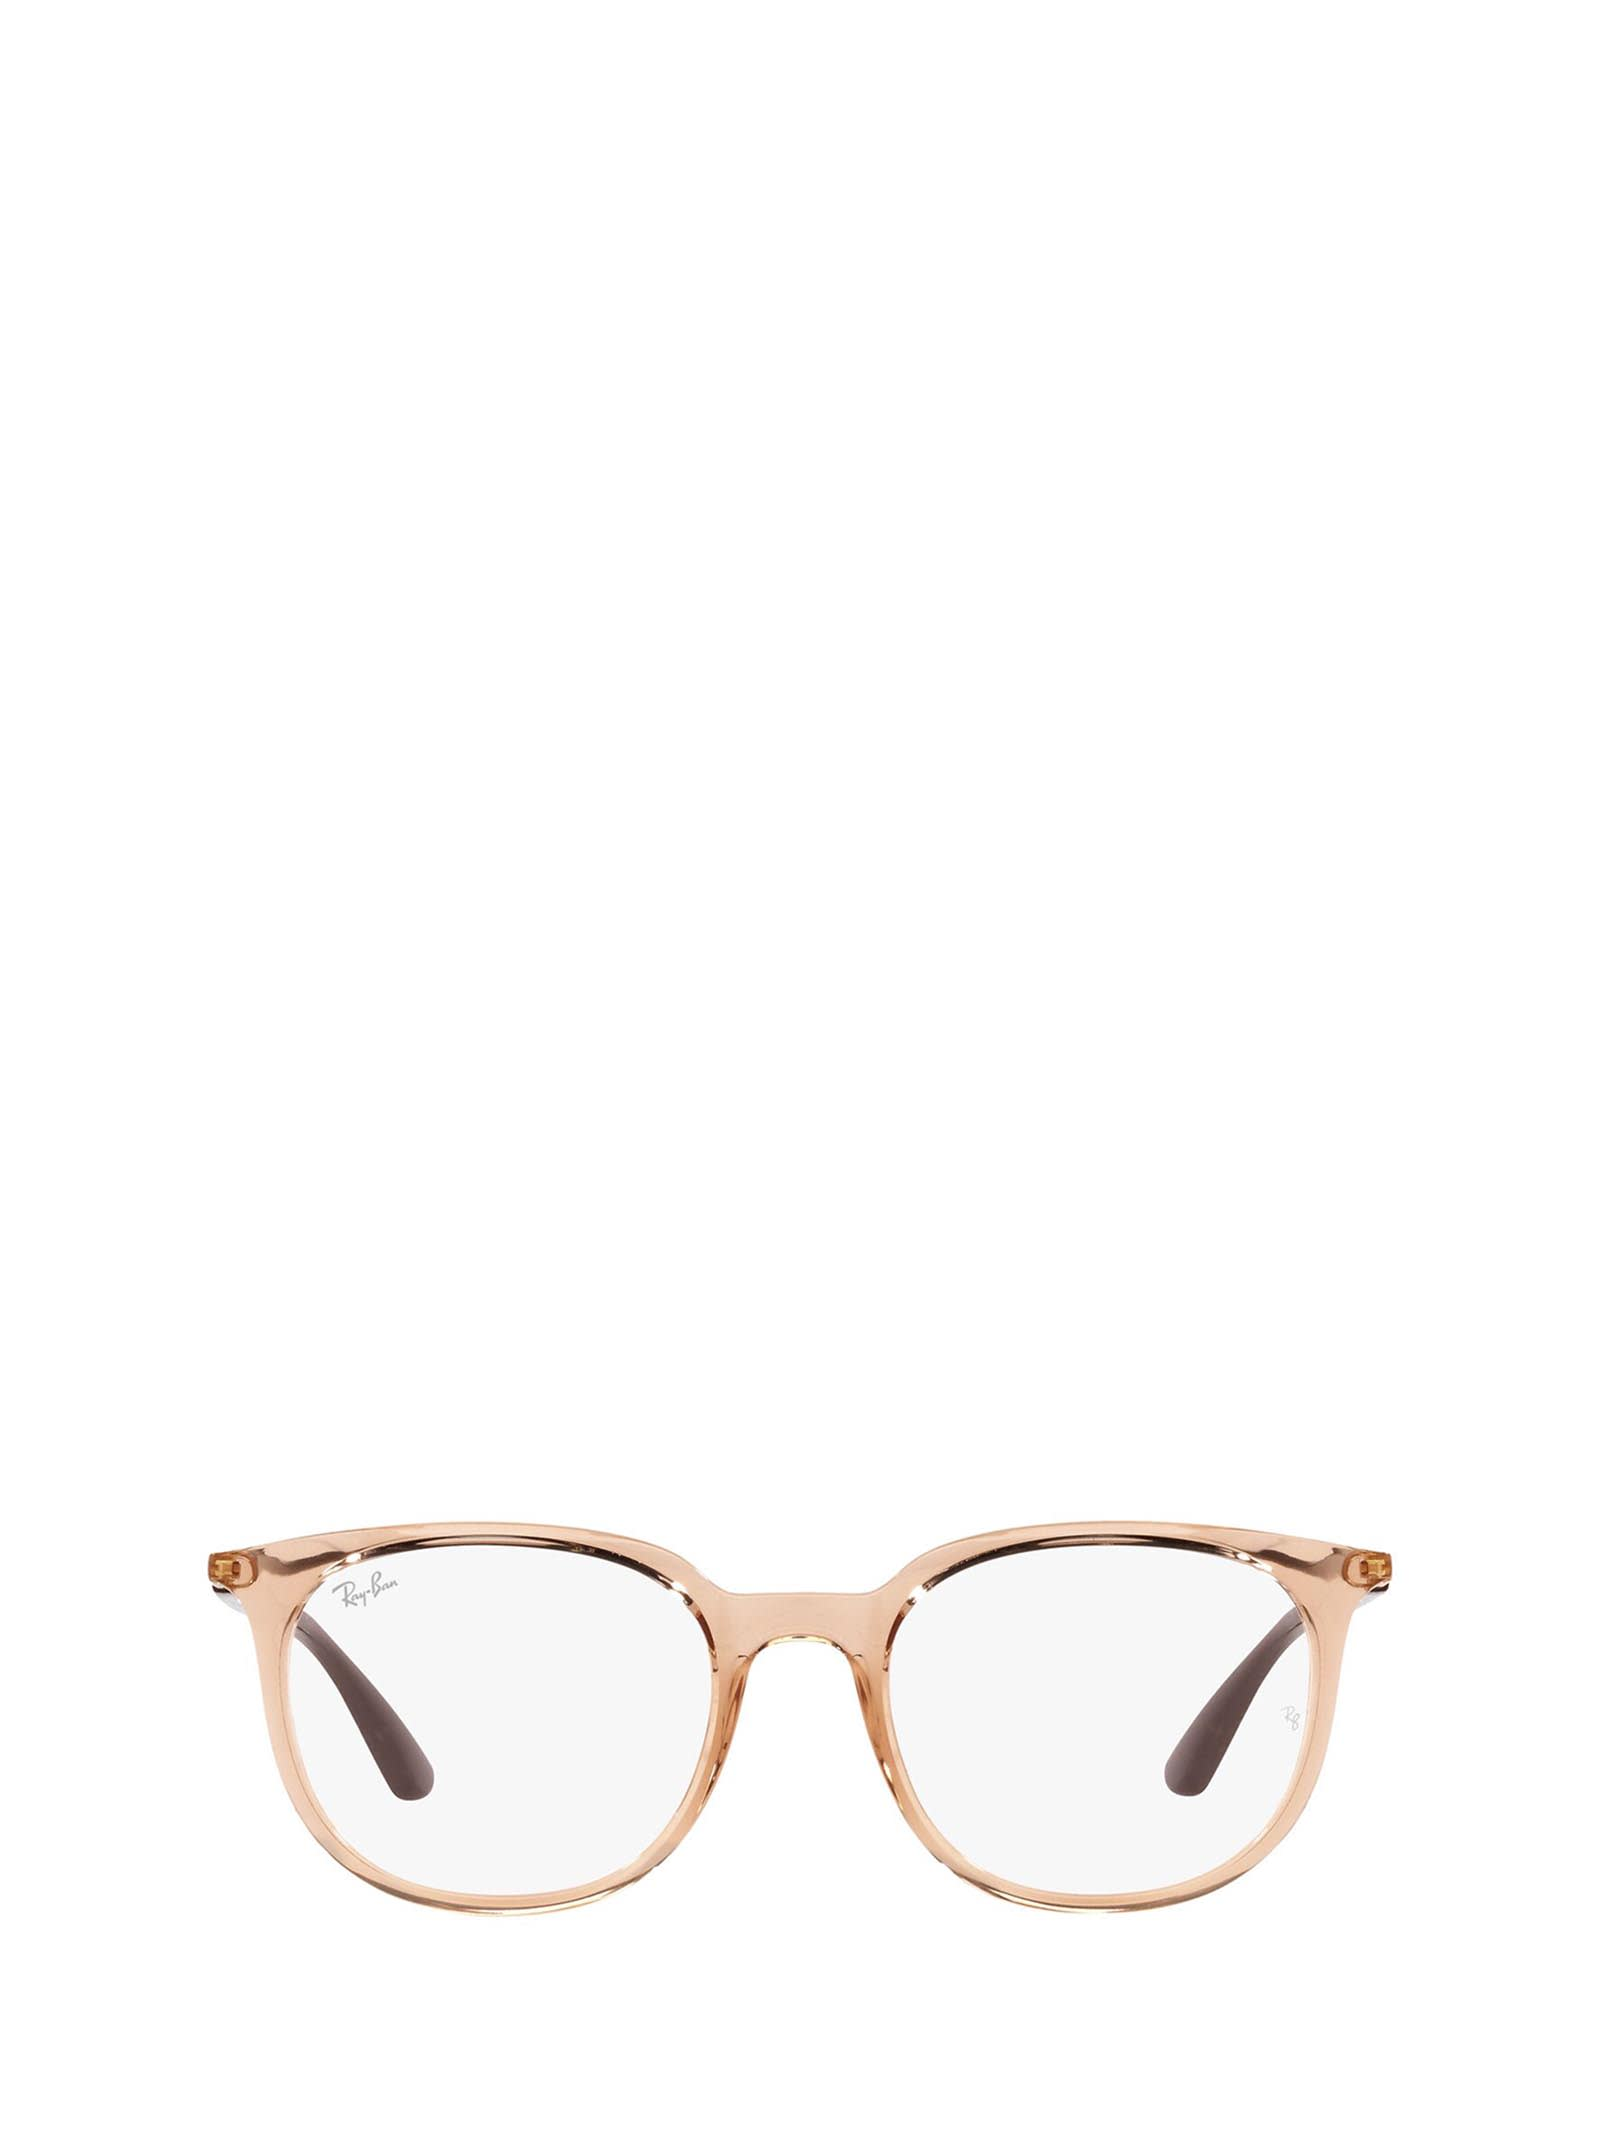 Ray-Ban Ray-ban Rx7190 Light Brown Glasses